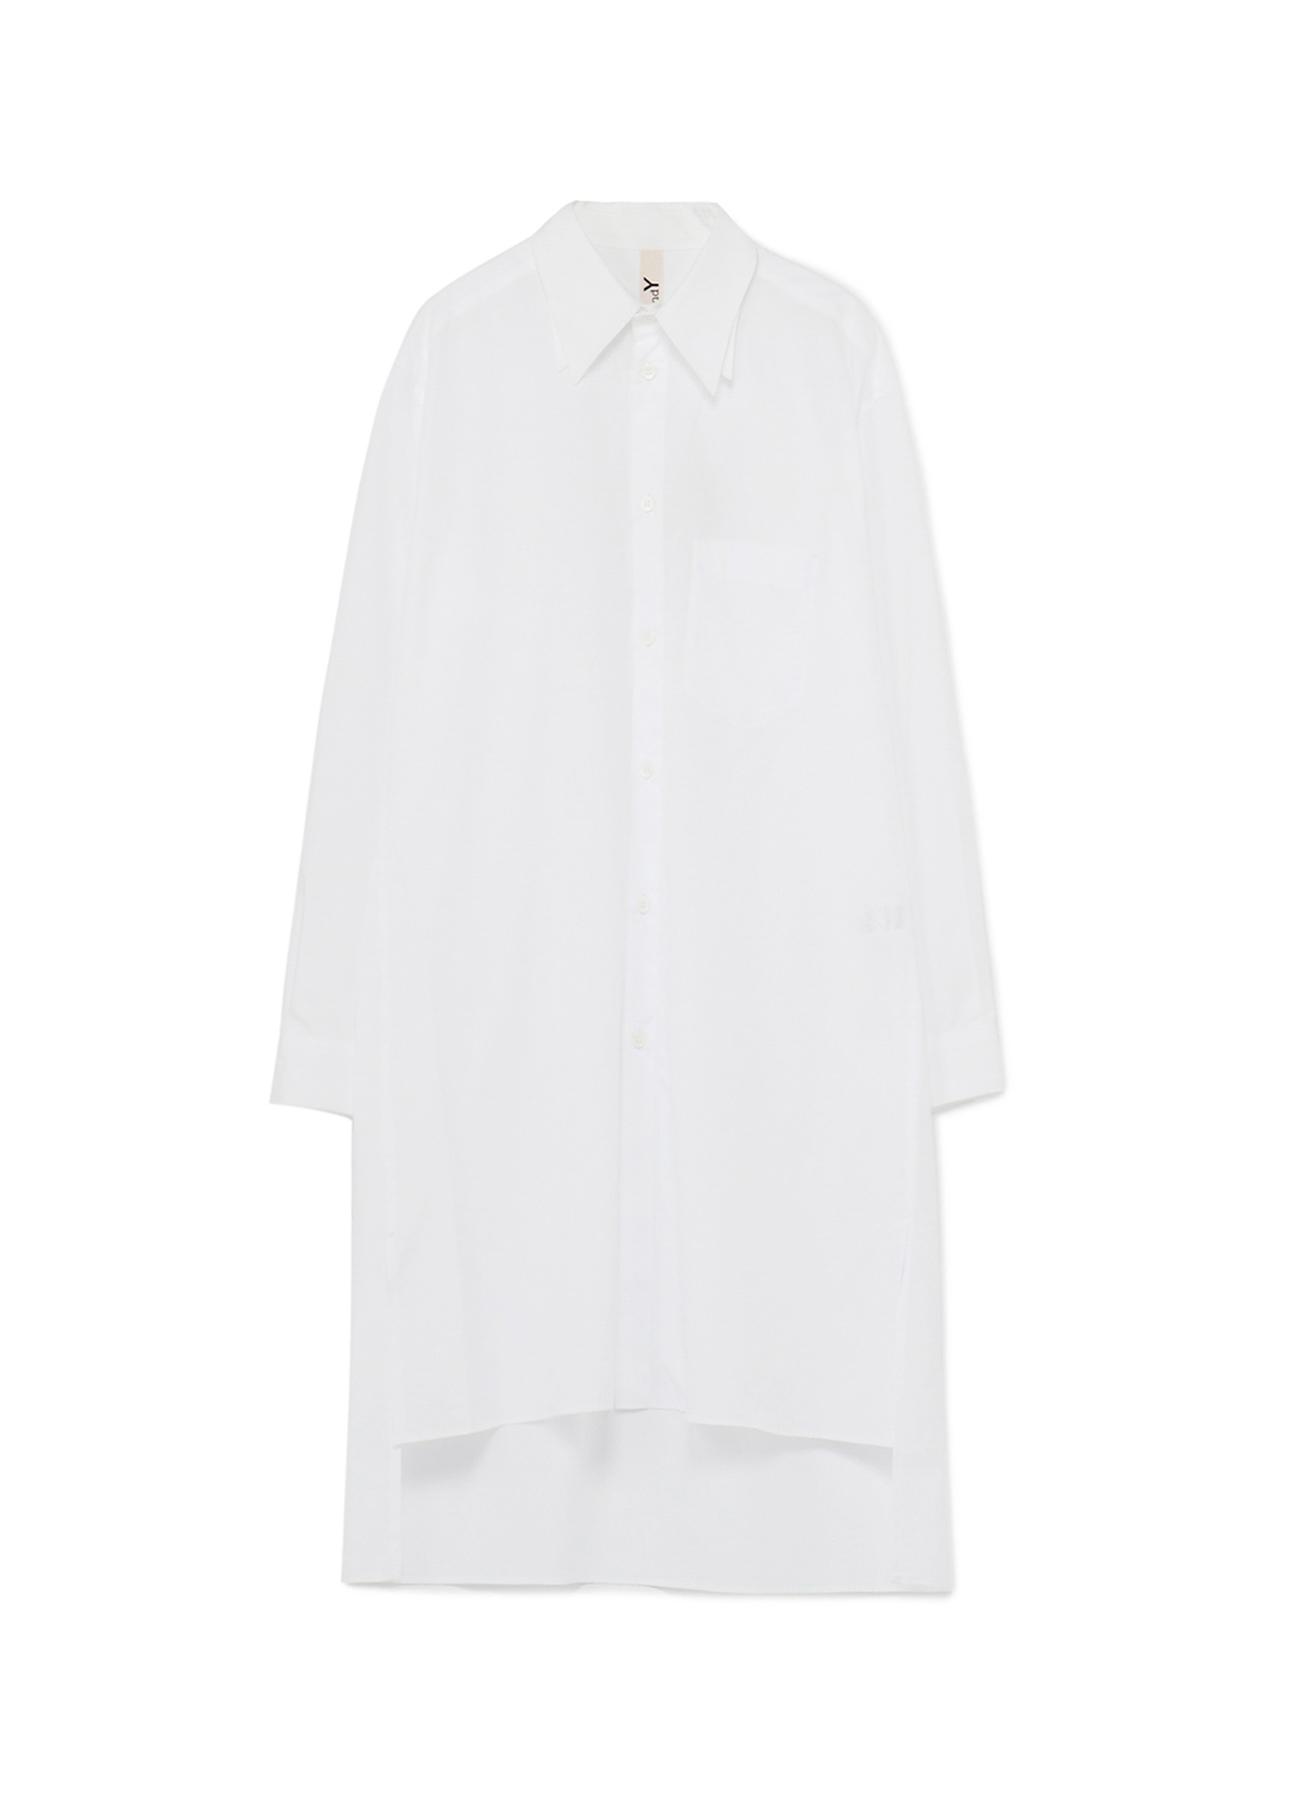 100/2 Cotton Broad Double Collar Long Shirt